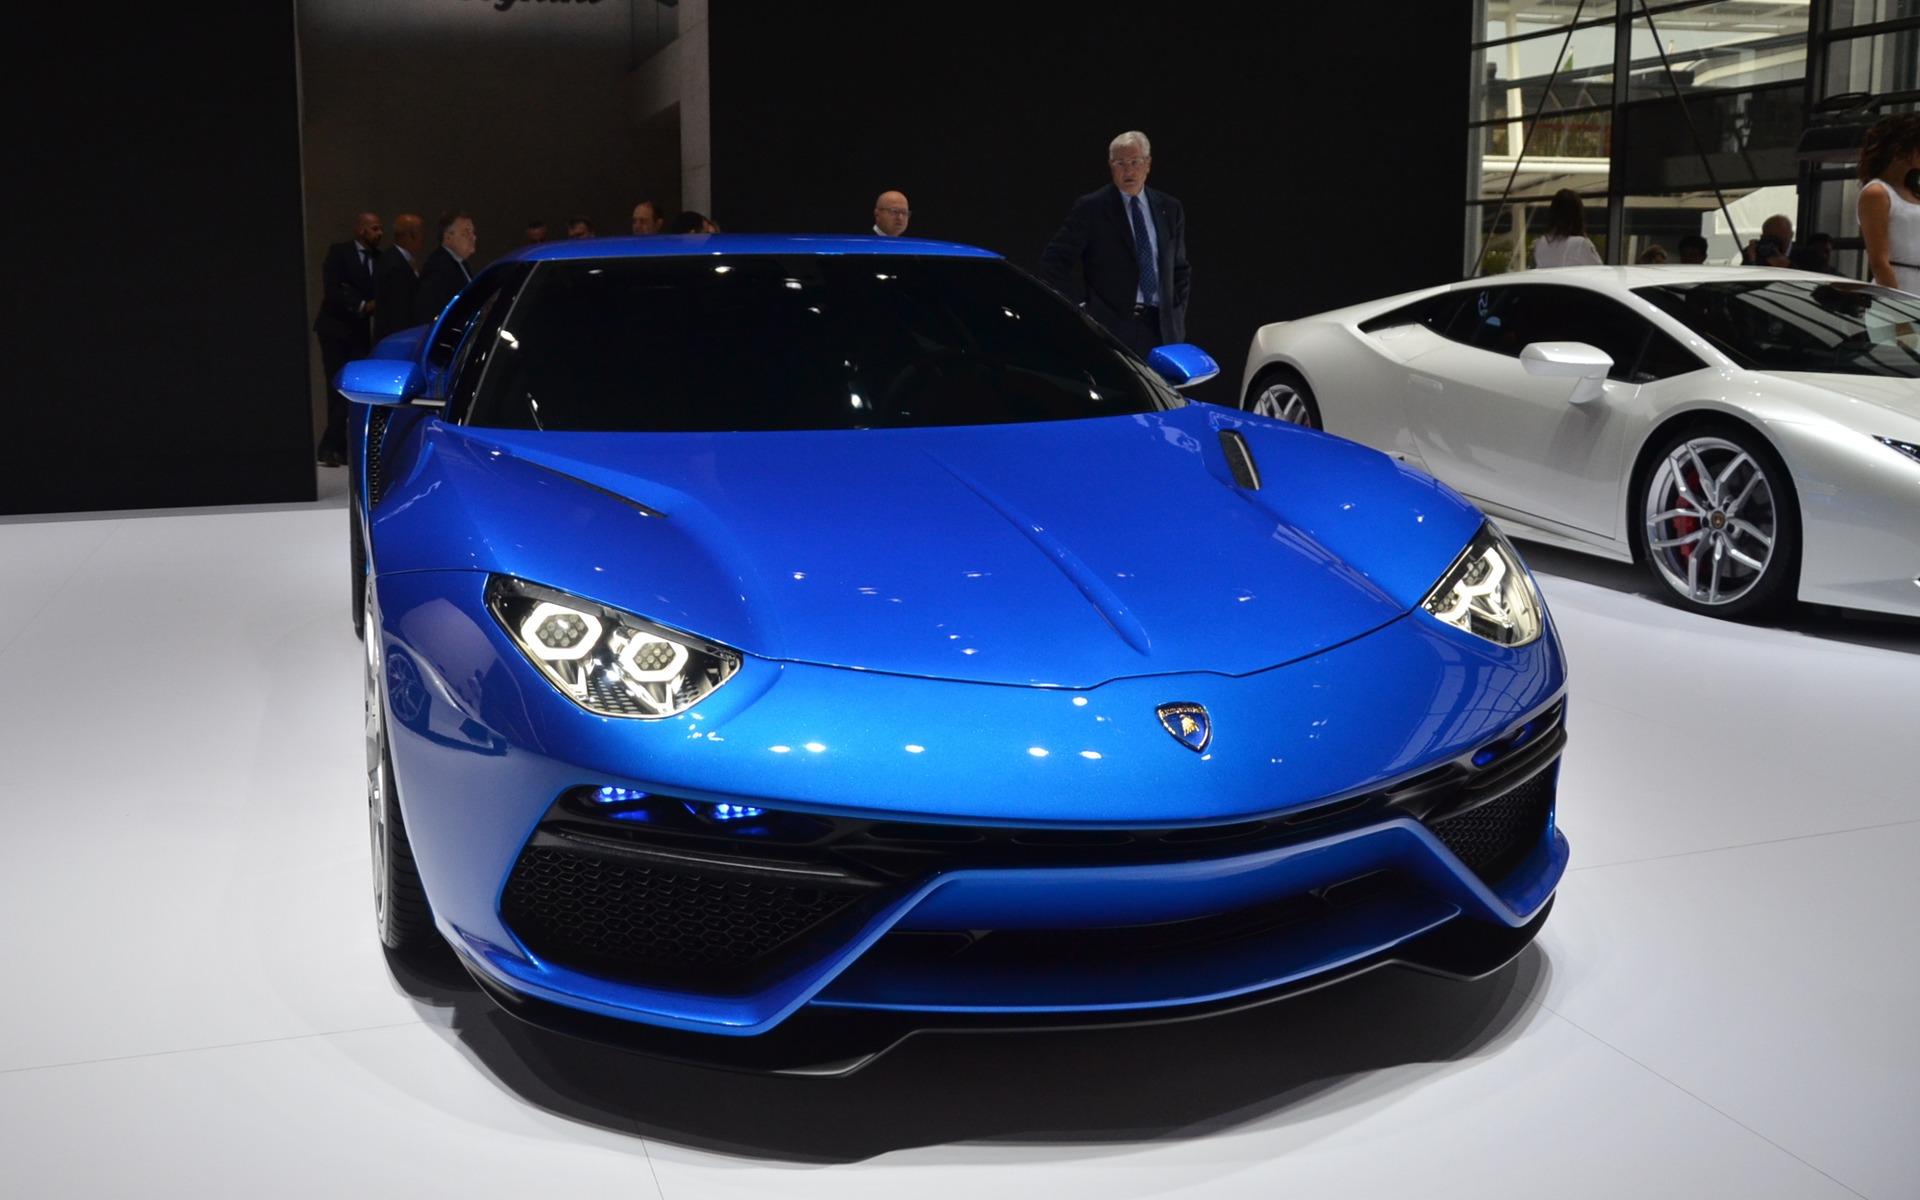 Lamborghini S Newest Concept The Asterion 2 12